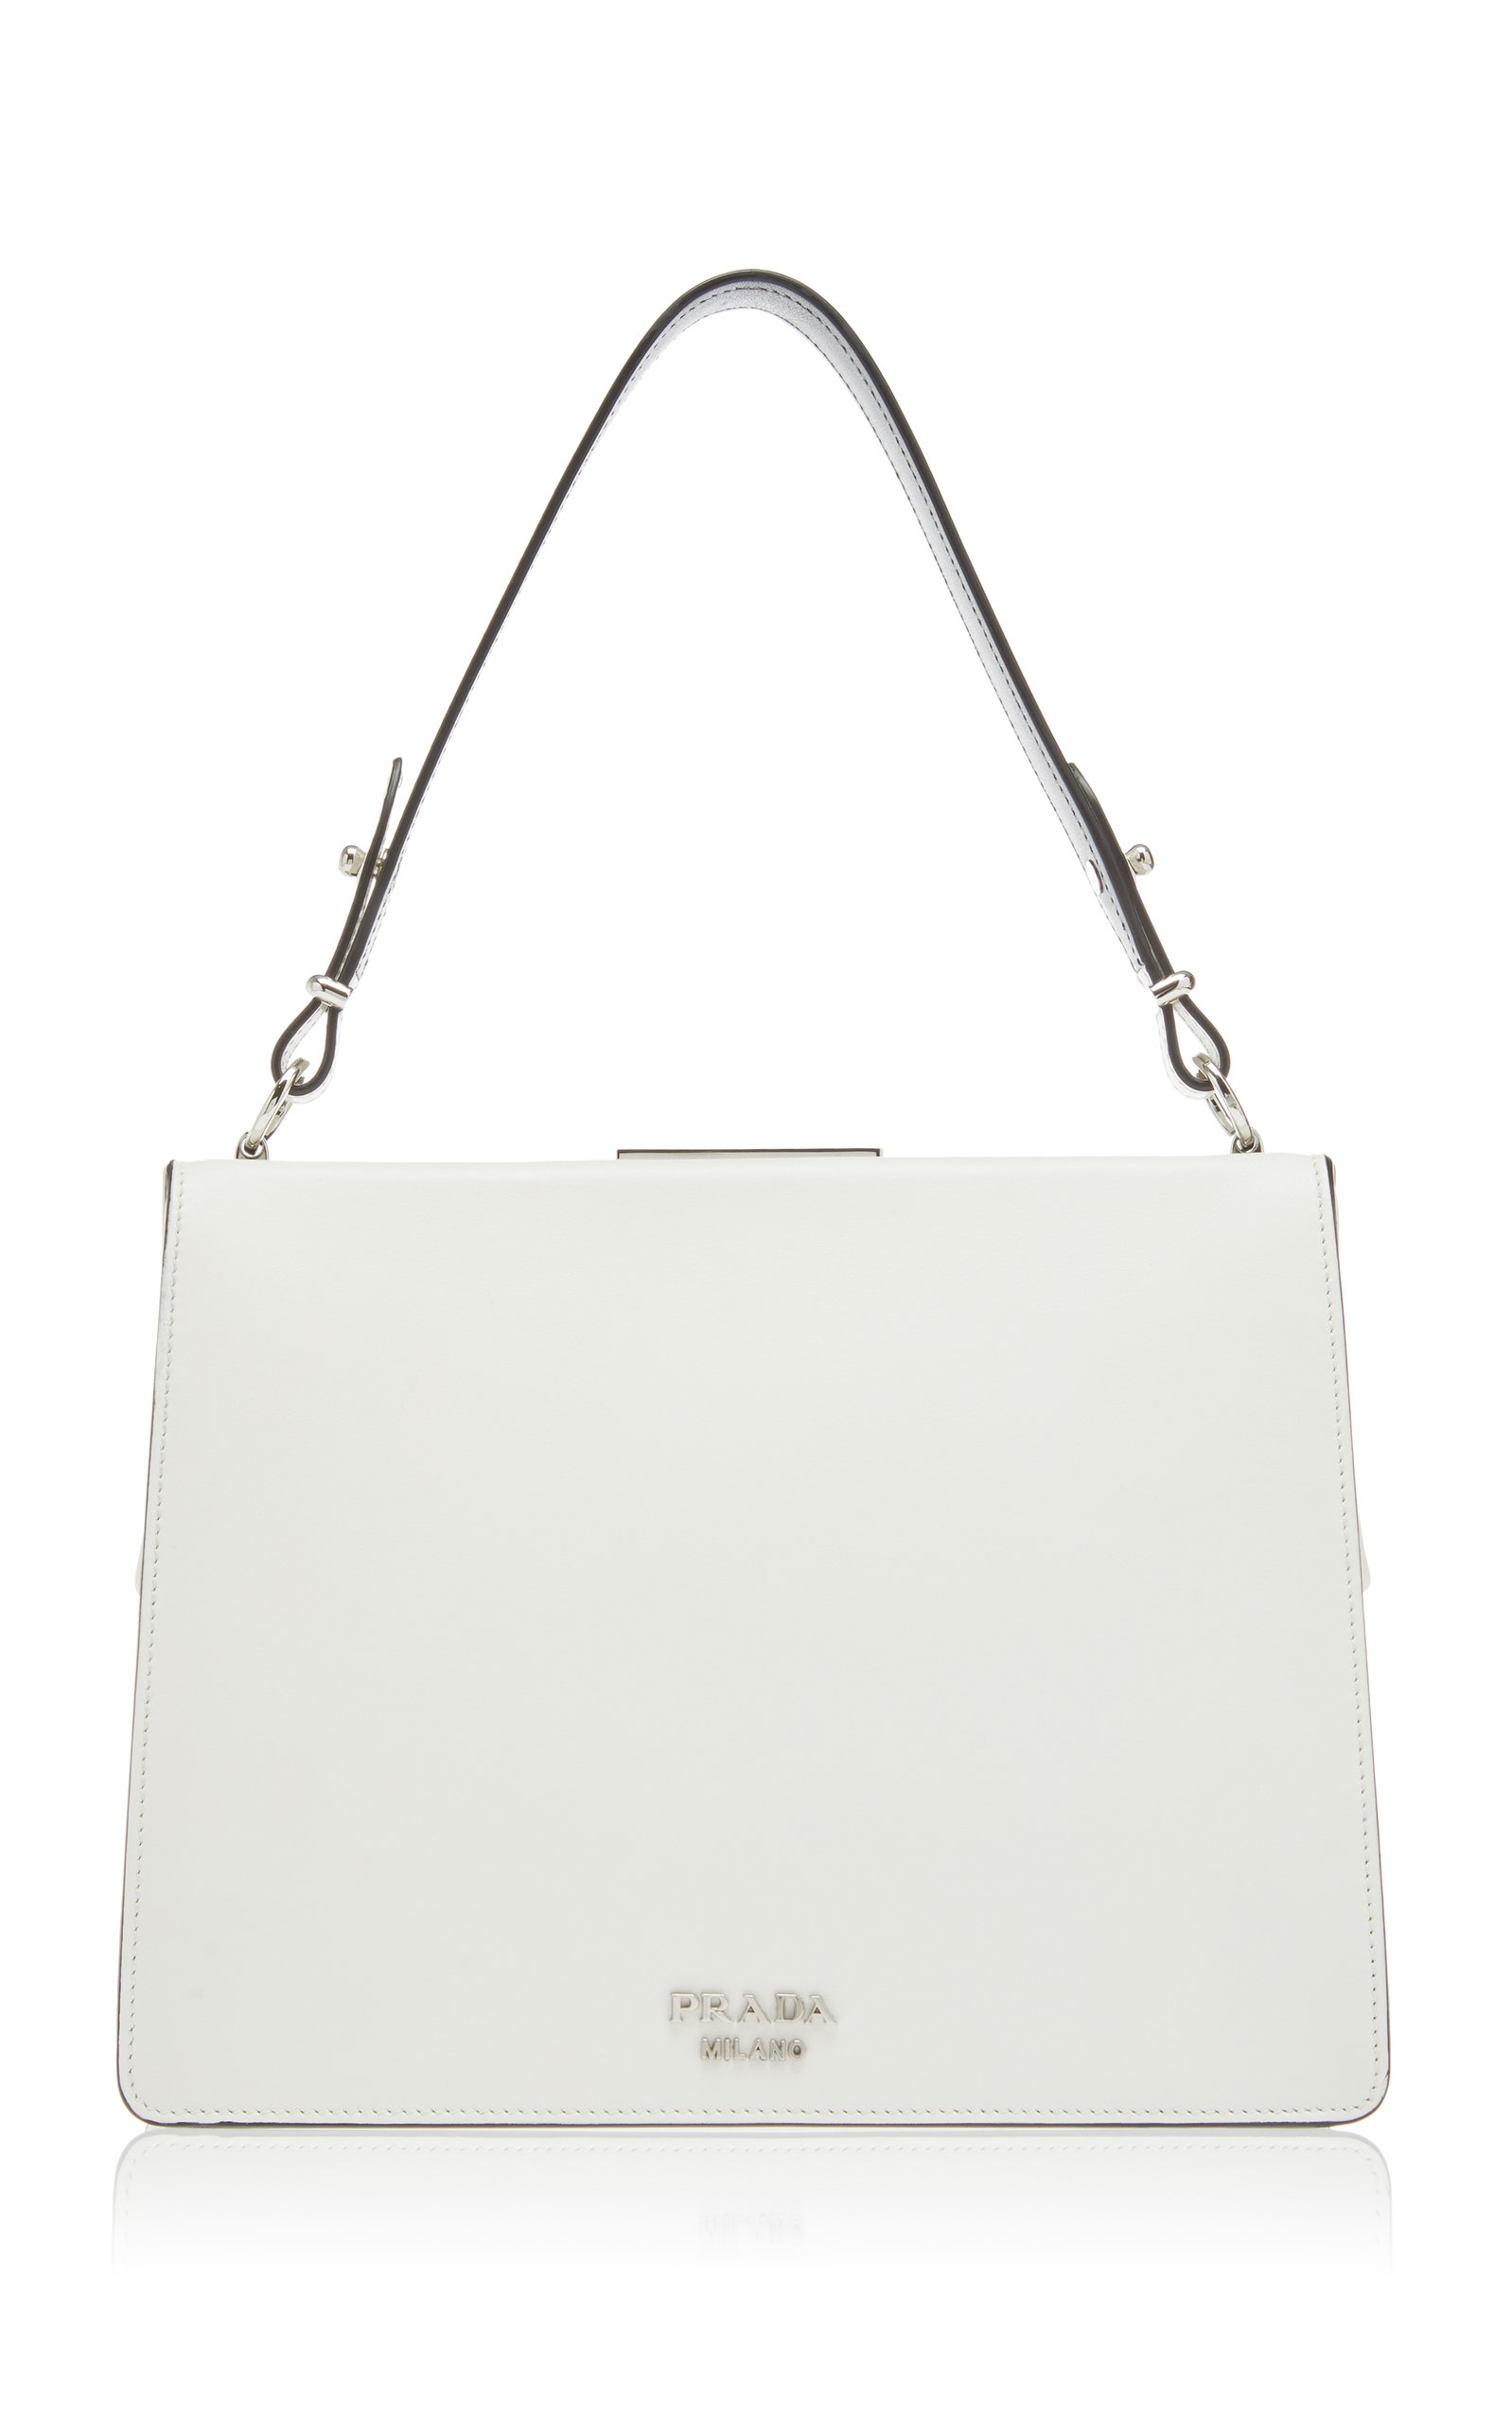 1bf5ea8610cf best price prada white tote bag neiman marcus 08b17 a1642; switzerland city  calf top handle with monkey by prada moda operandi 217e2 ddeaa